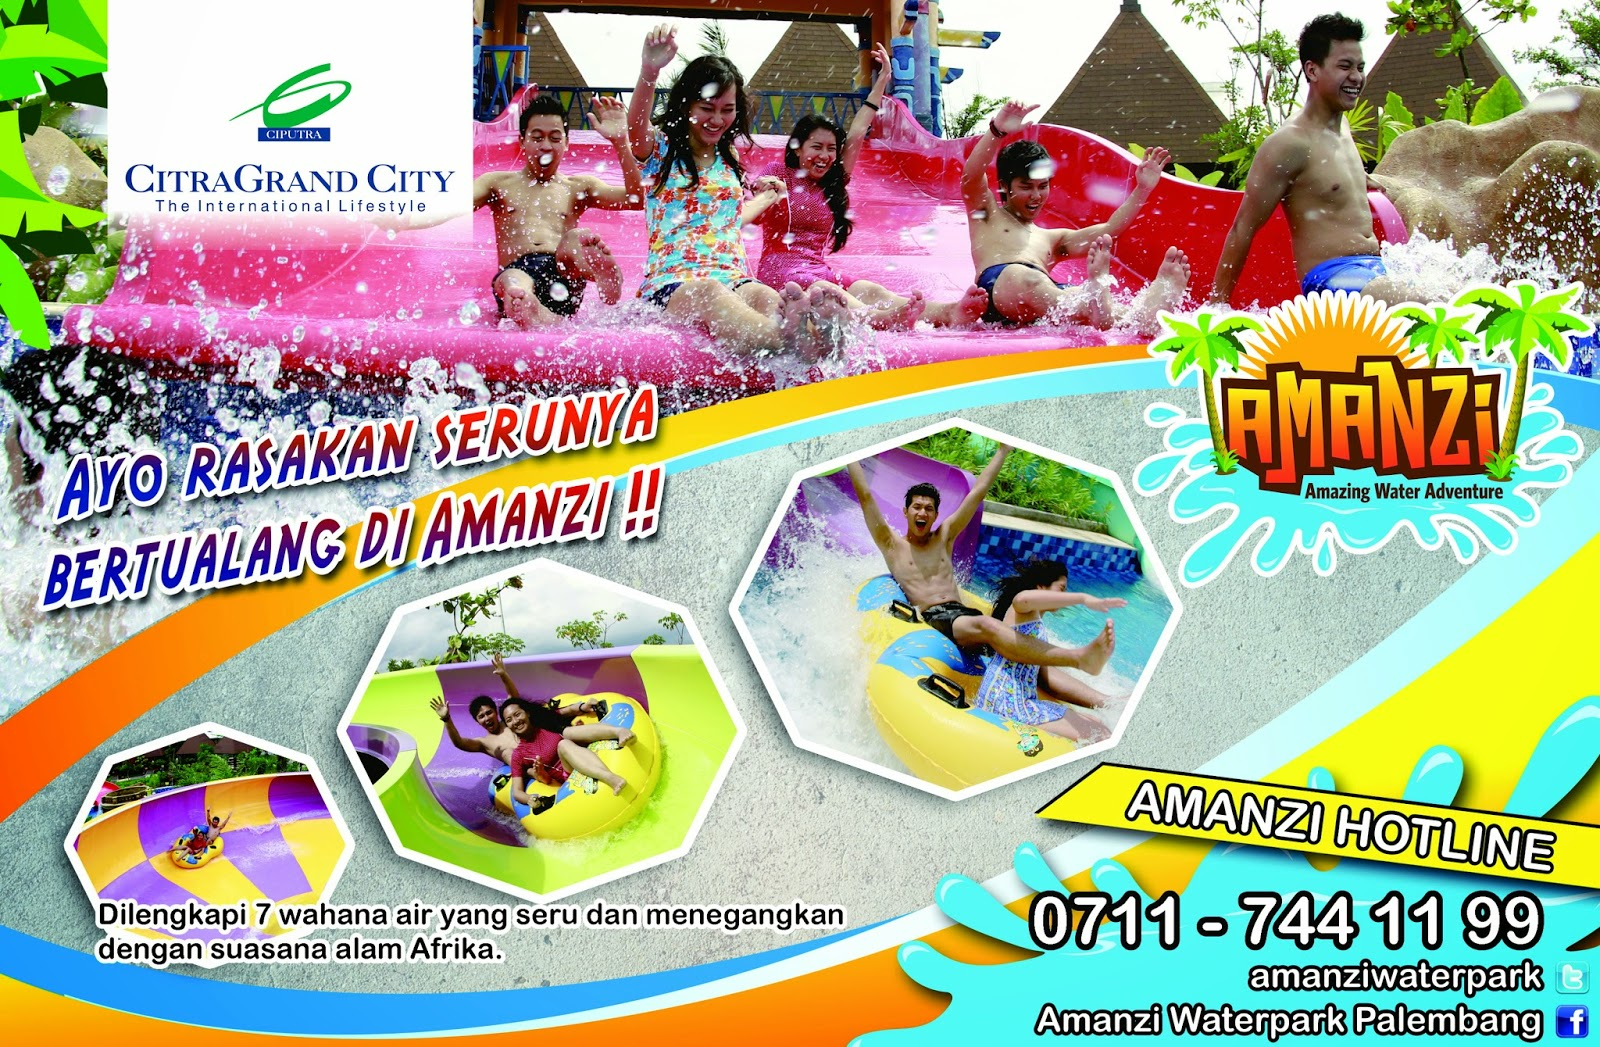 Seputar Citragrand City Palembang Amanzi Waterpark Bagi Wisatawan Datang Kota